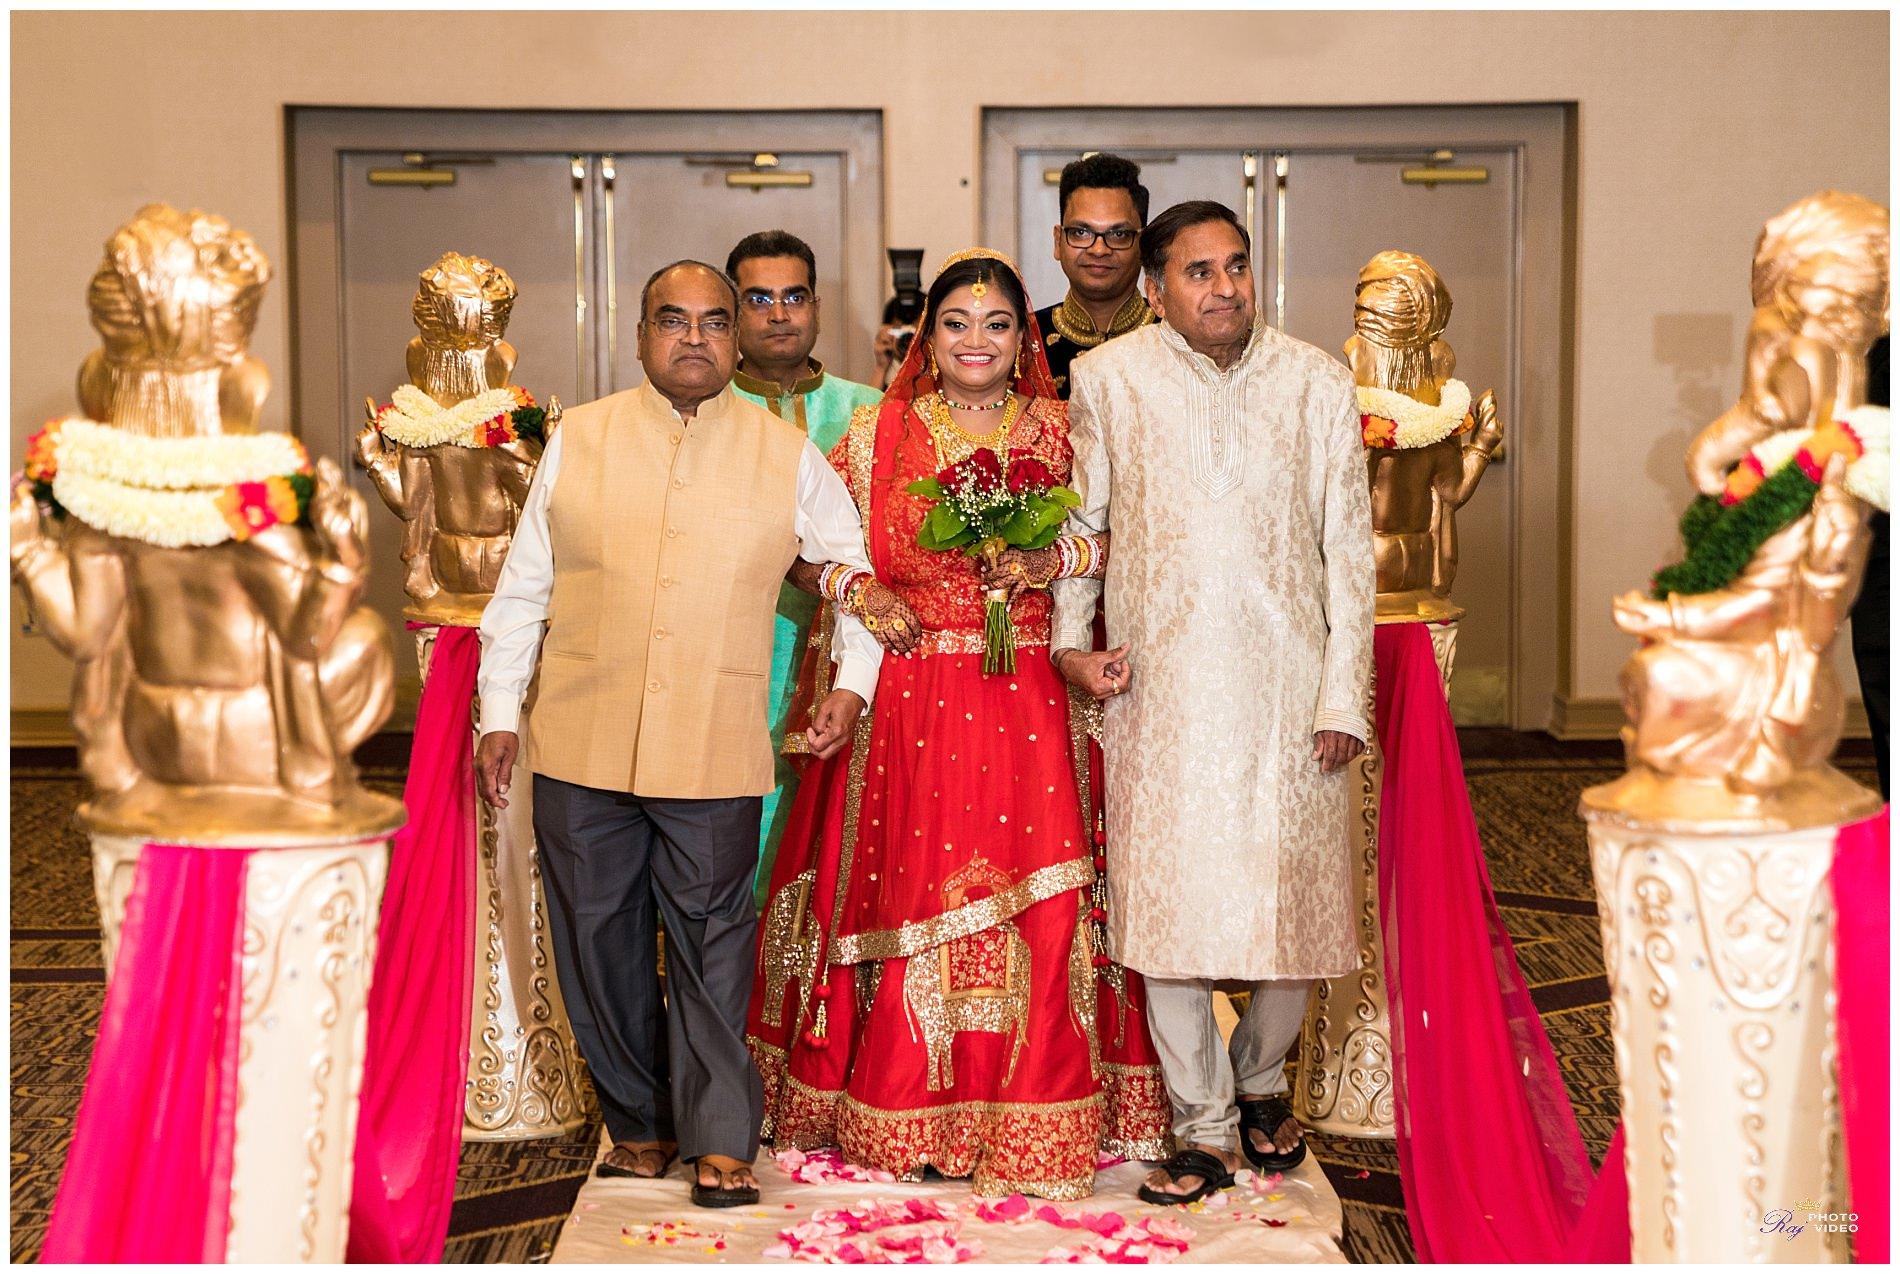 doubletree-by-hilton-hotel-wilmington-de-wedding-krishna-ritesh-54.jpg